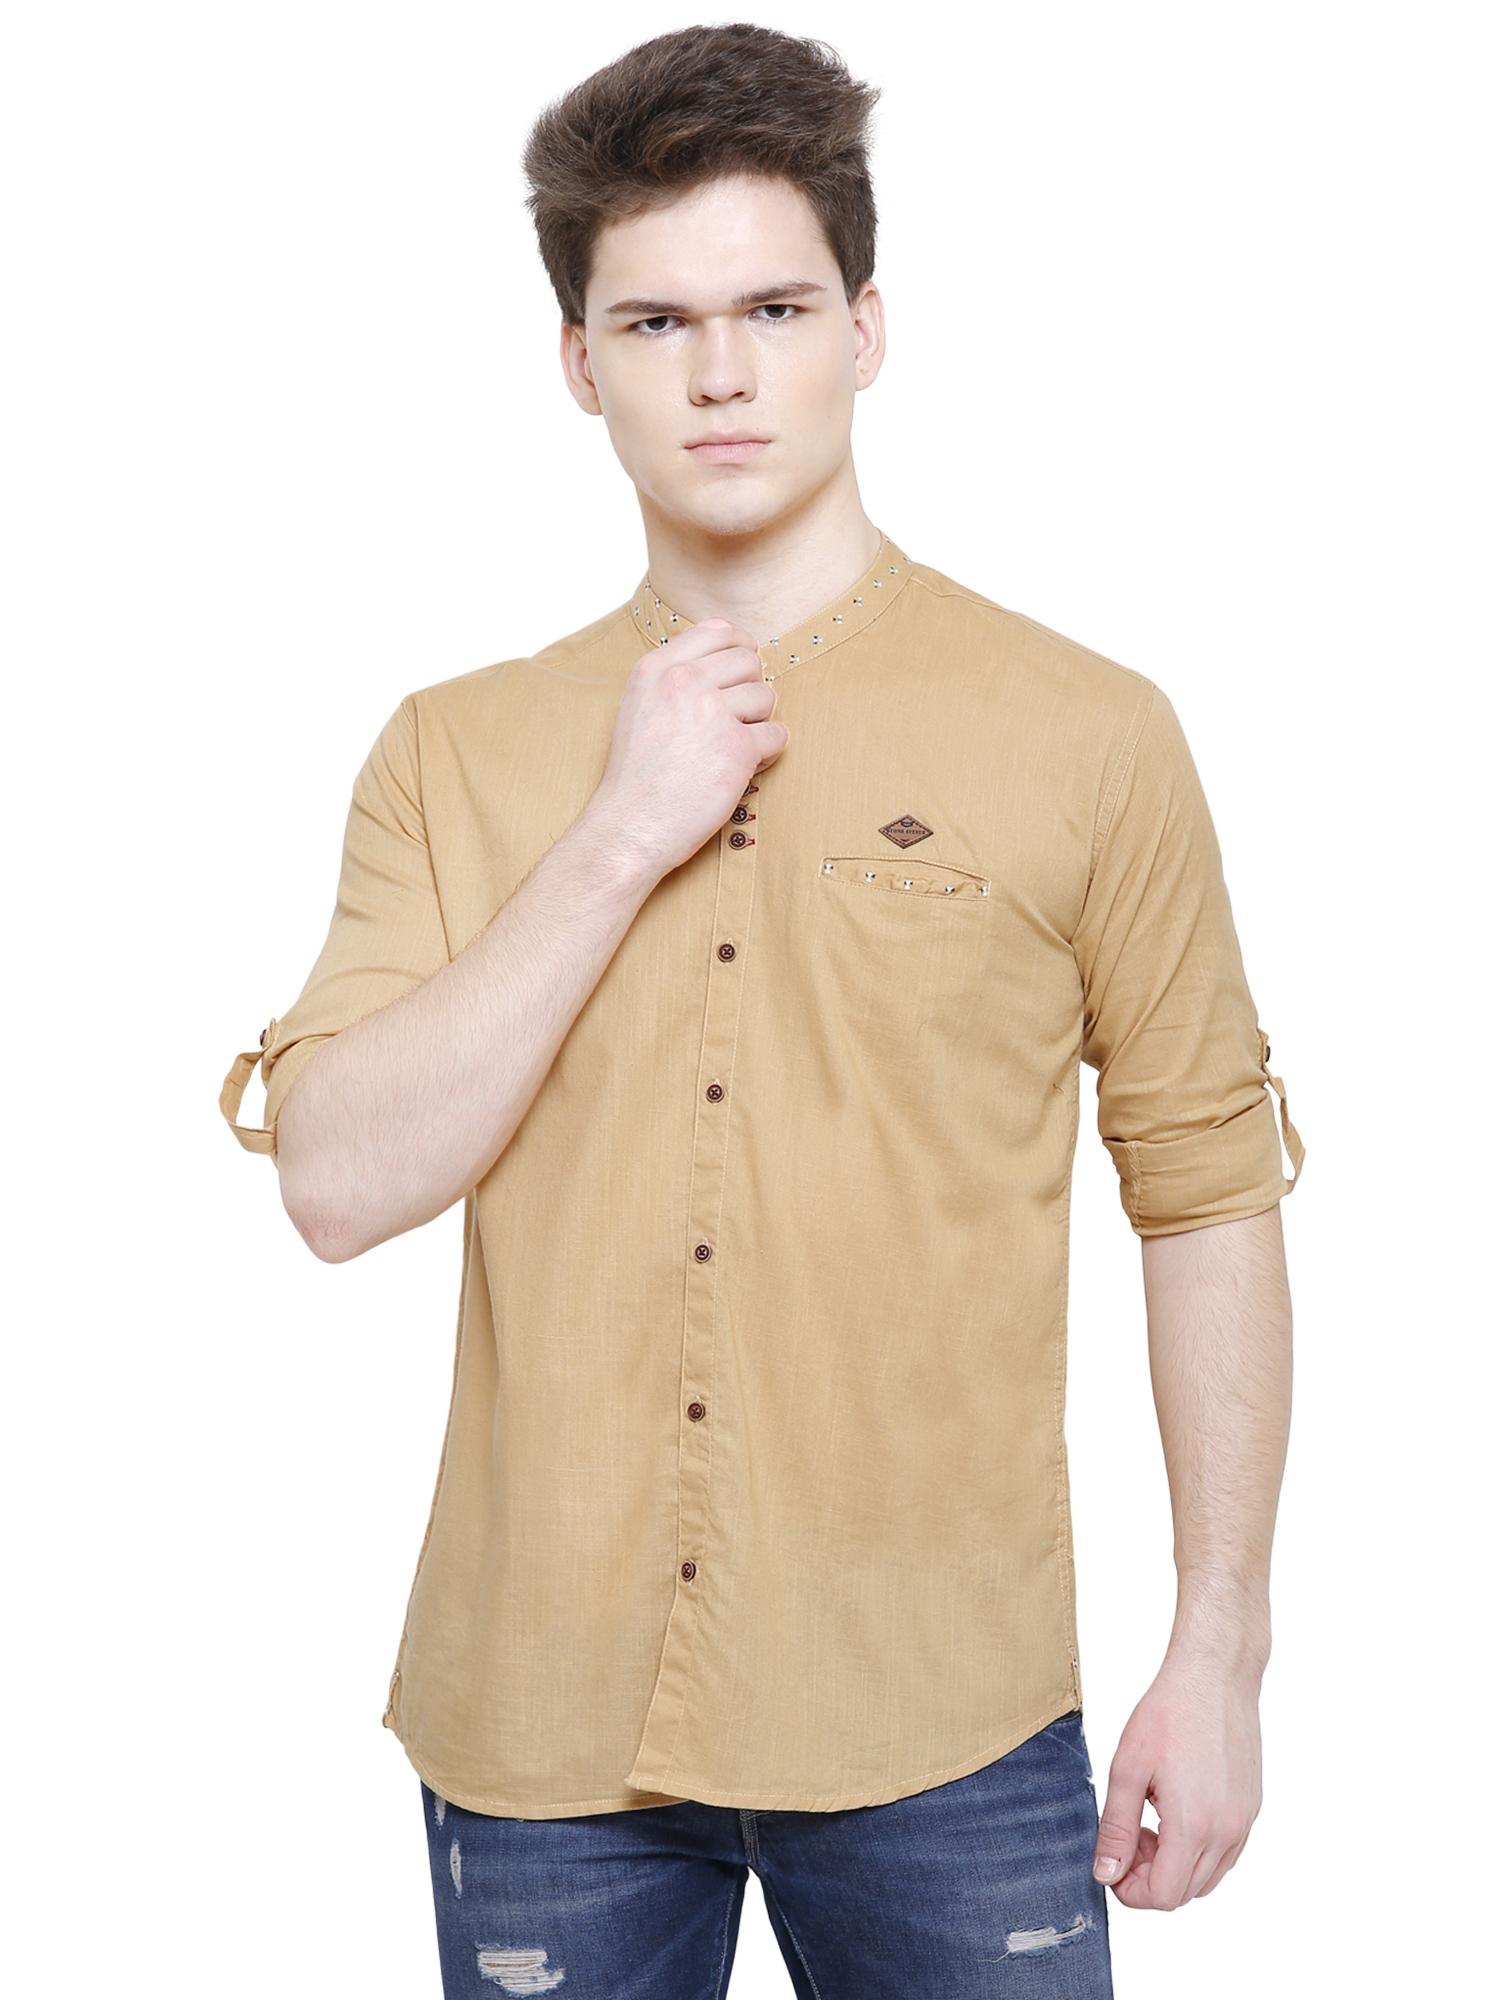 Kuons Avenue | Kuons Avenue Men's Beige Khaki Linen Cotton Shirt- KACLFS1280BE